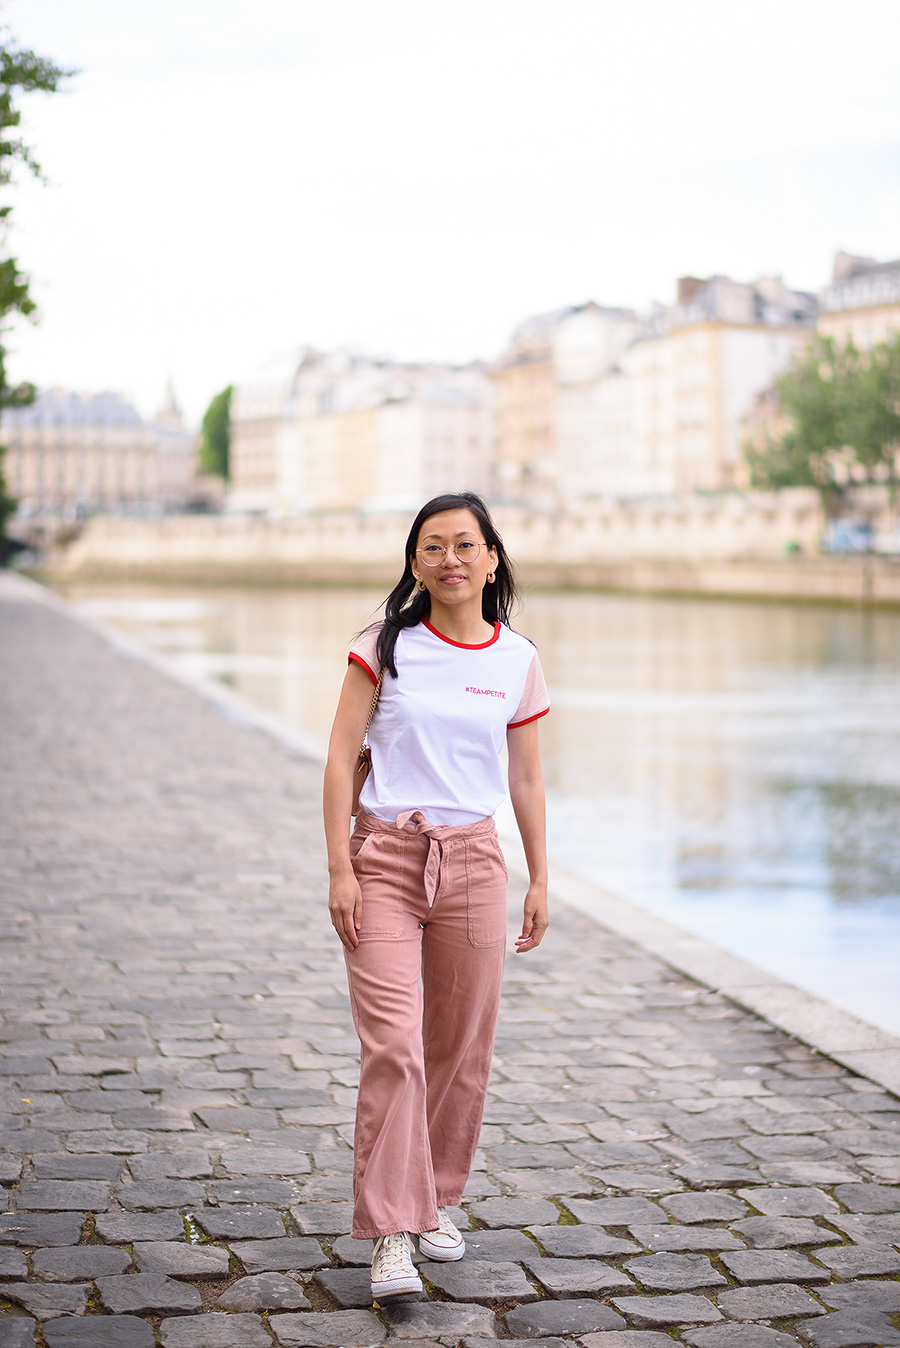 petite-and-so-what-tee-shirt-teampetite900